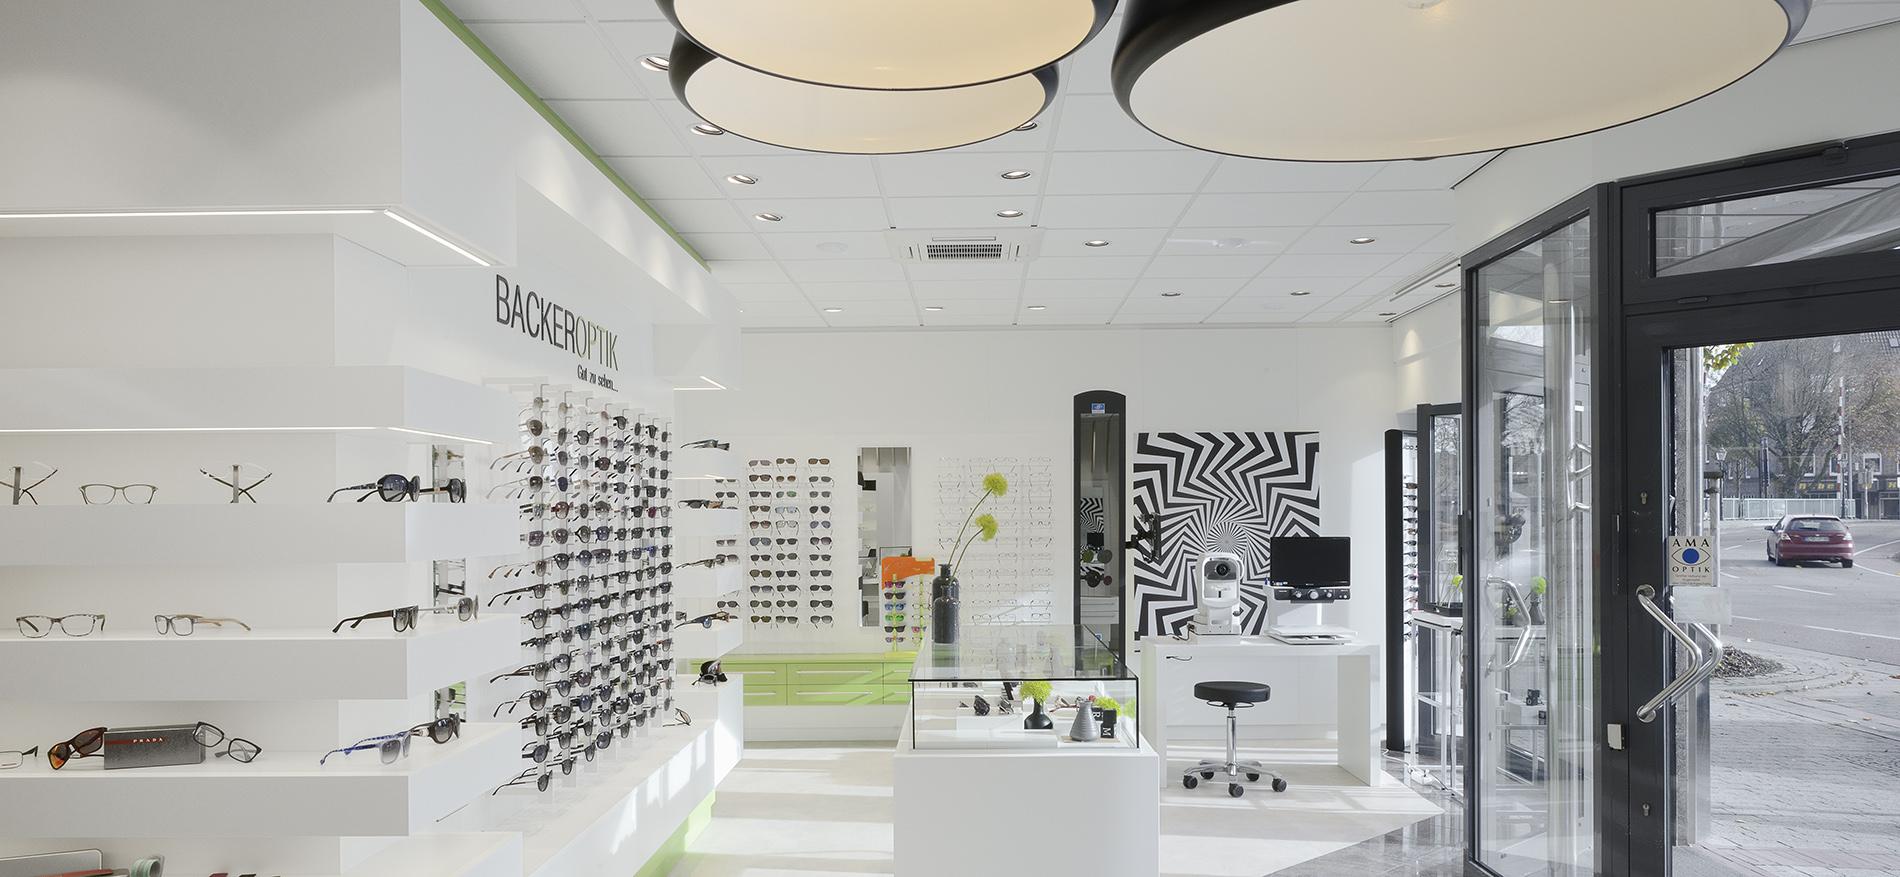 Einrichting Augenoptiker Backer Optik WSB Ladenbau